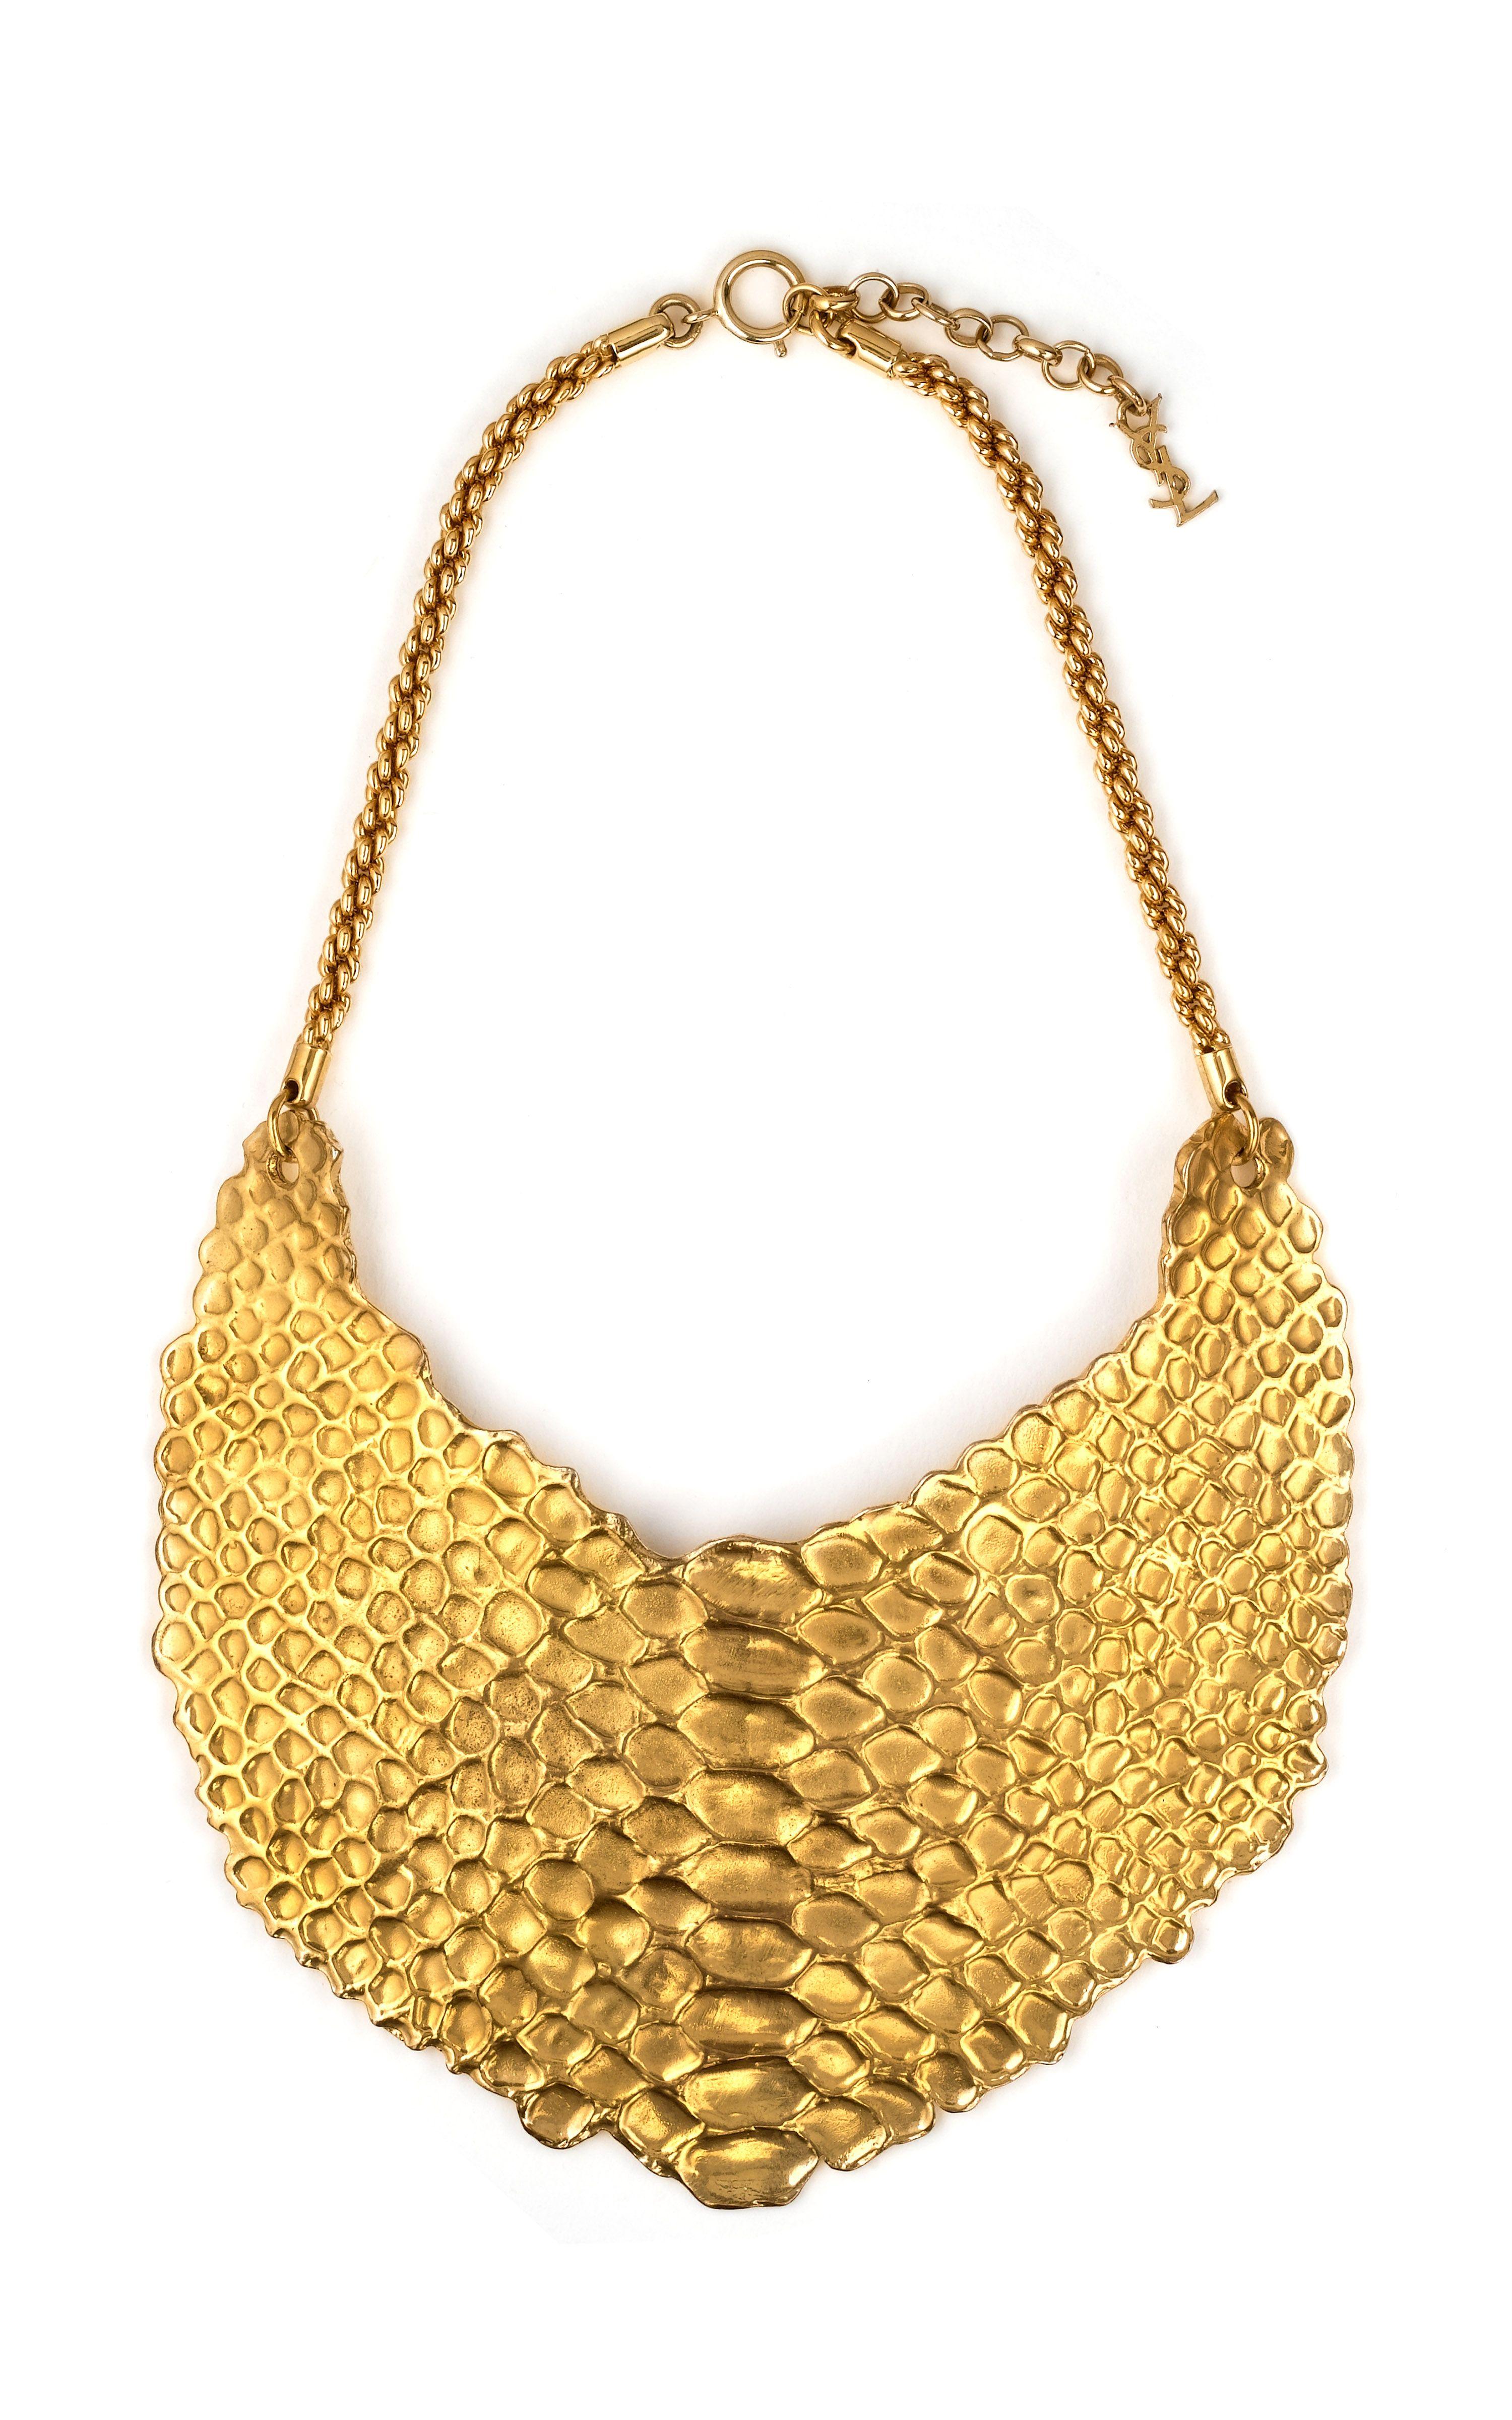 Ysl vintage reptile form bib necklace via moda operandi jewelry